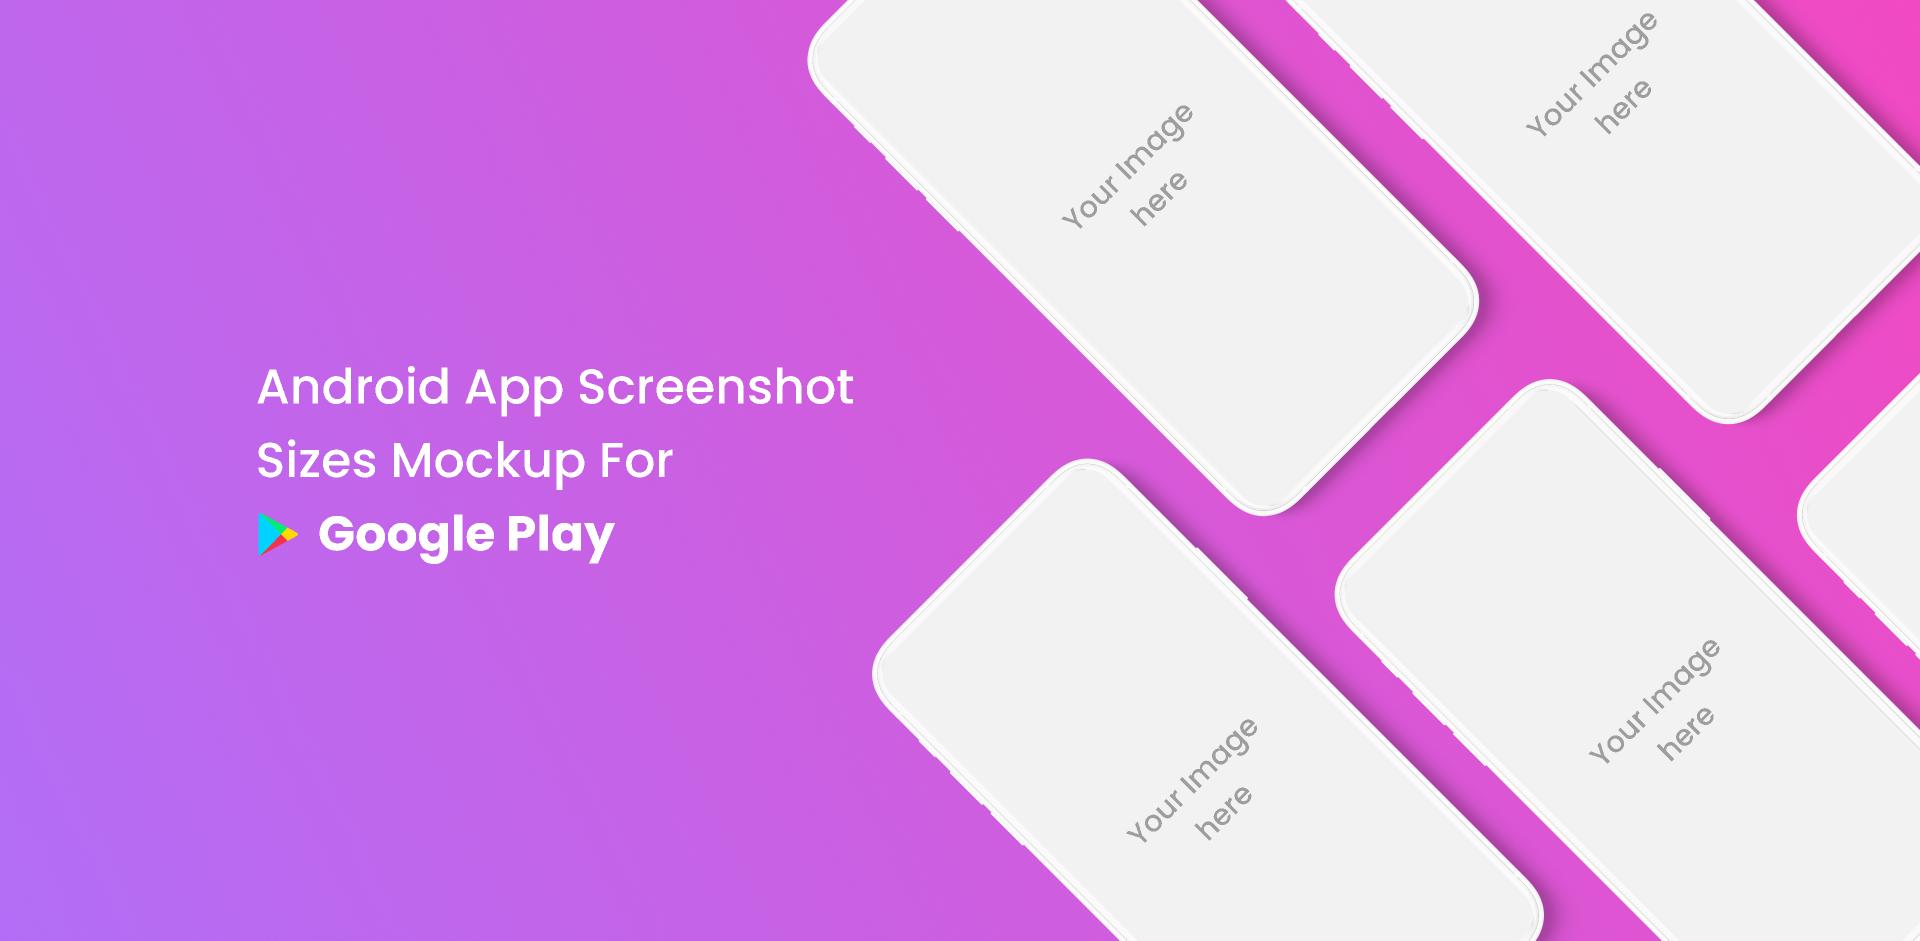 Figma Freebie Android App Screenshot Mockup For Google Playstore